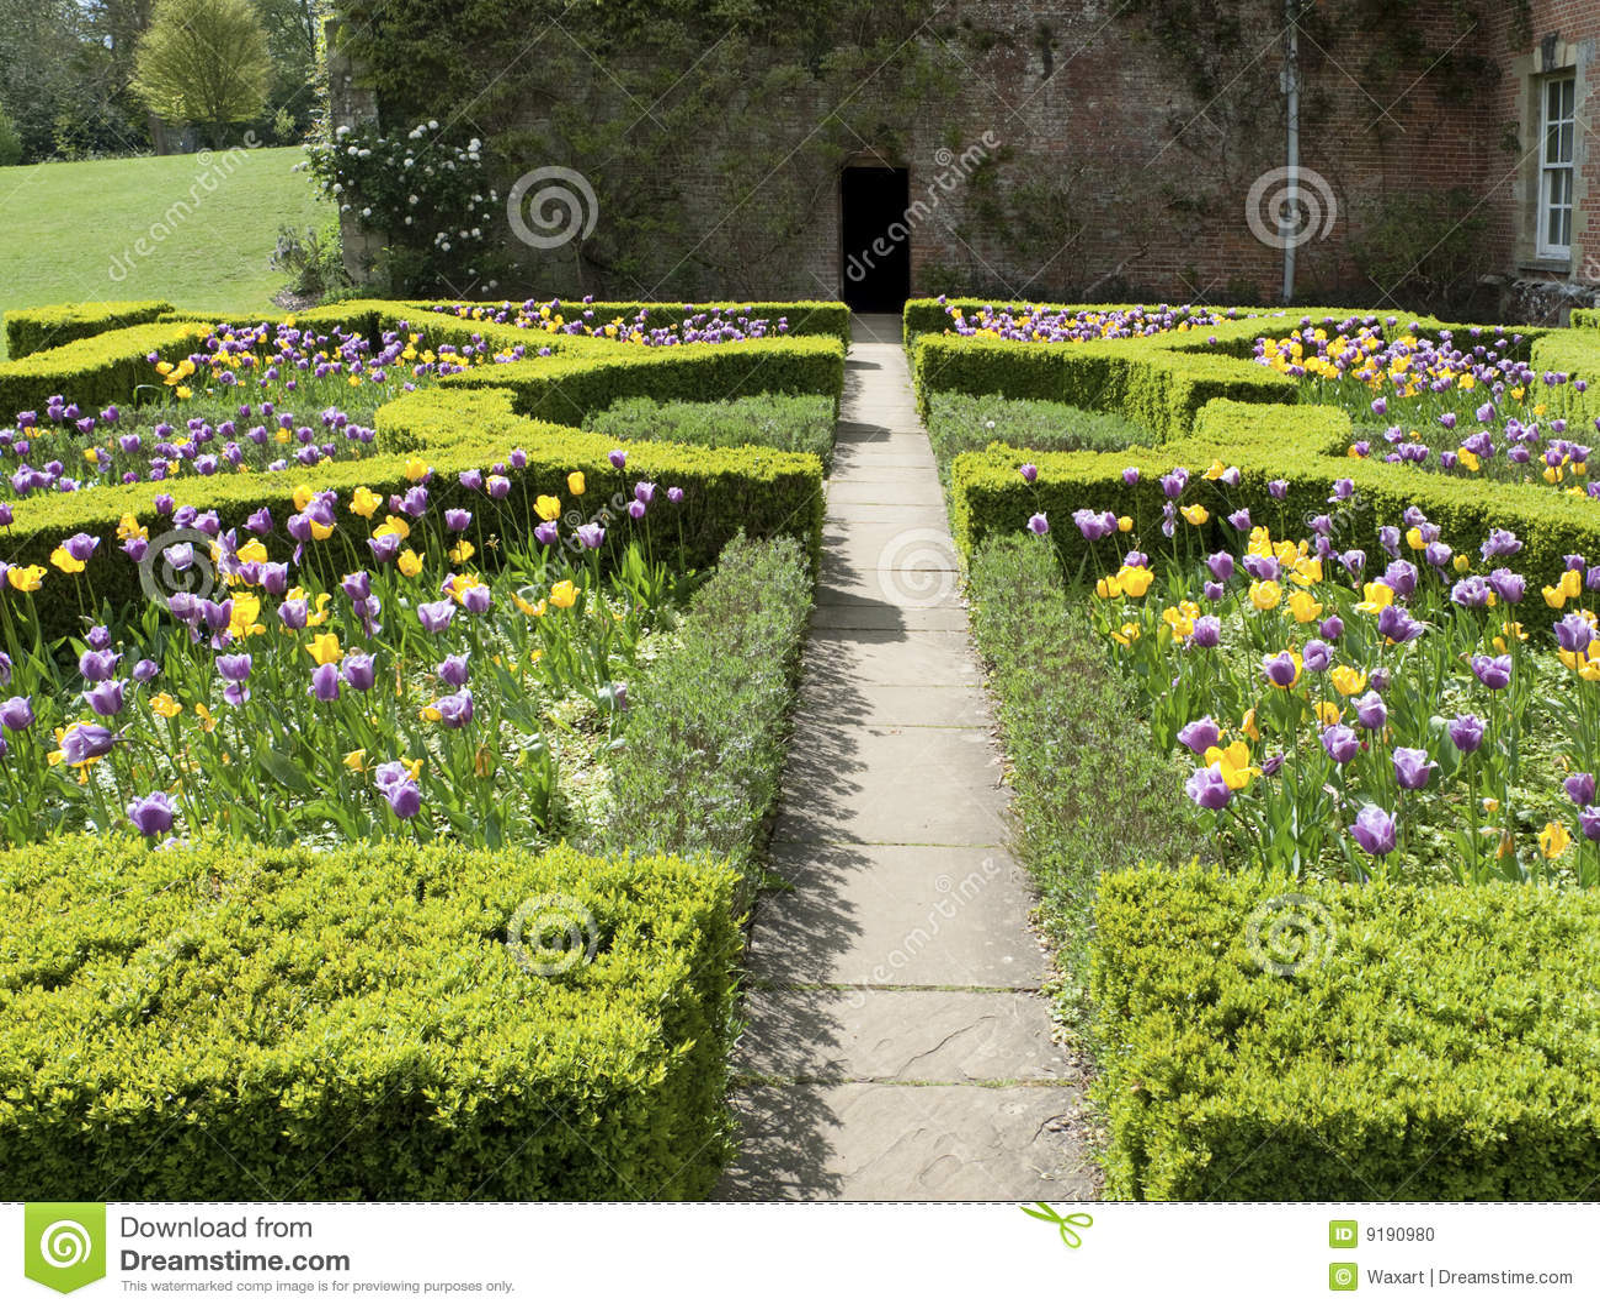 Jardin anglais formel au printemps photo stock image for Conception jardin anglais